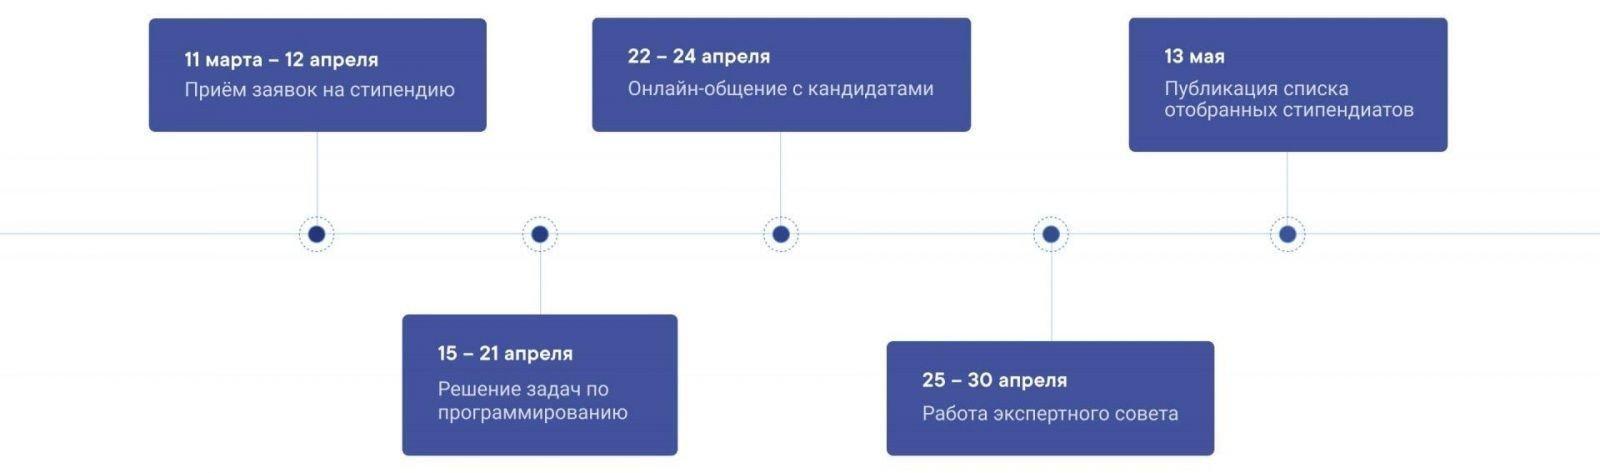 ВКонтакте открыл приём заявок на вторую стипендиальную программу VK Fellowship (vk fellowship timeline)